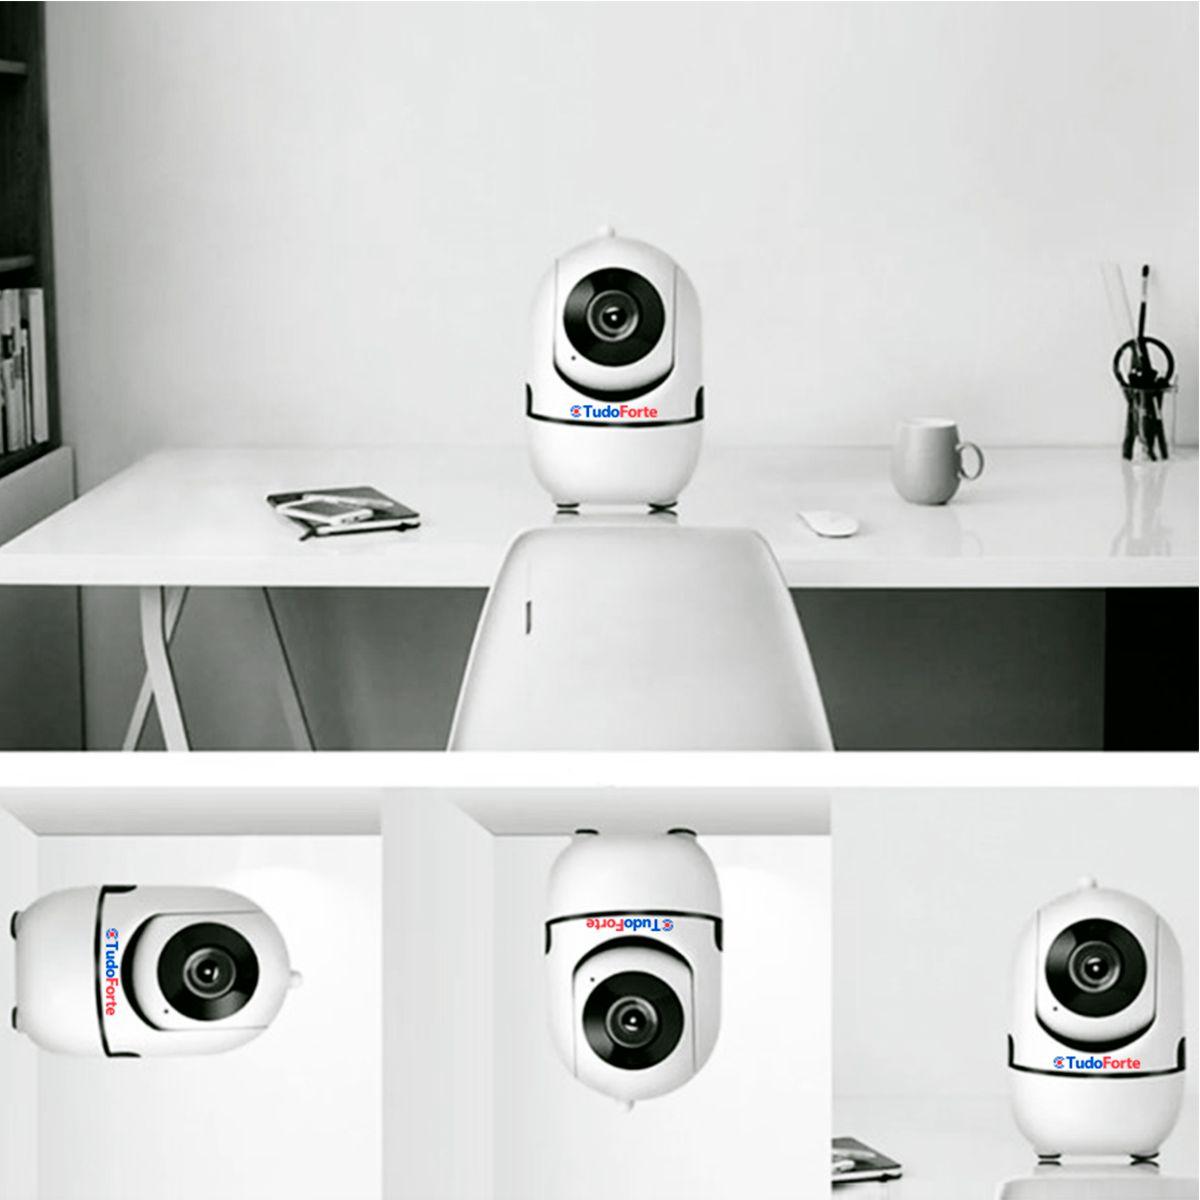 camera-intelbras-hd-720p-vip-1130-b-04